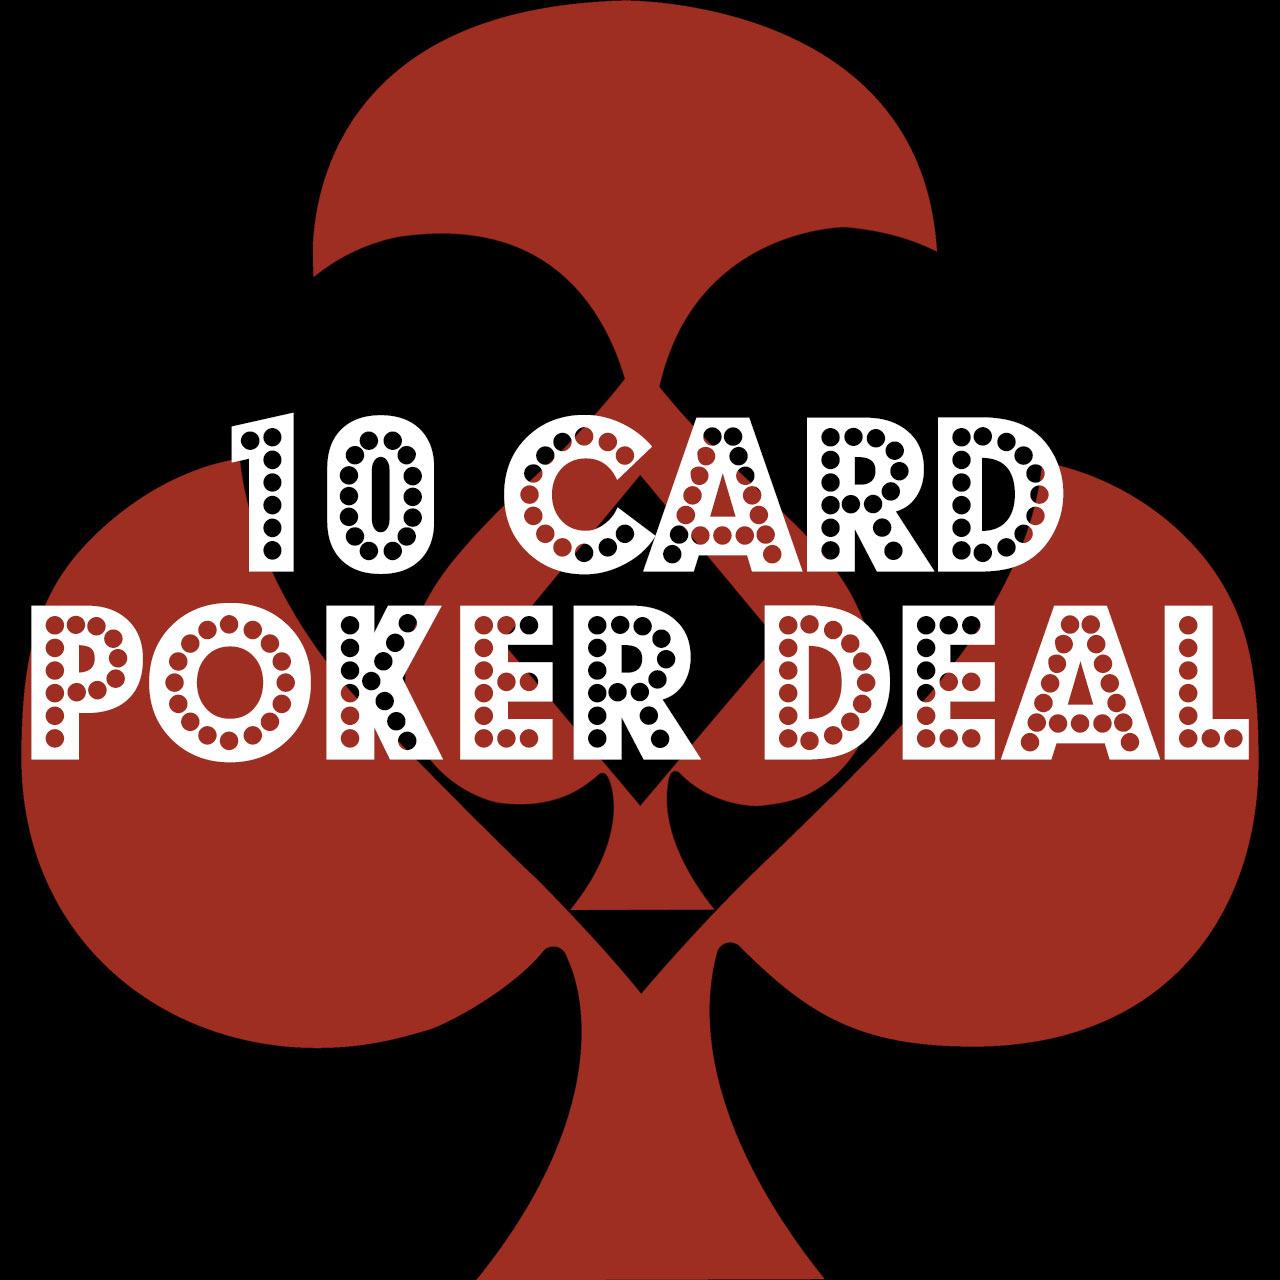 10 card poker magic trick cabin fever slots